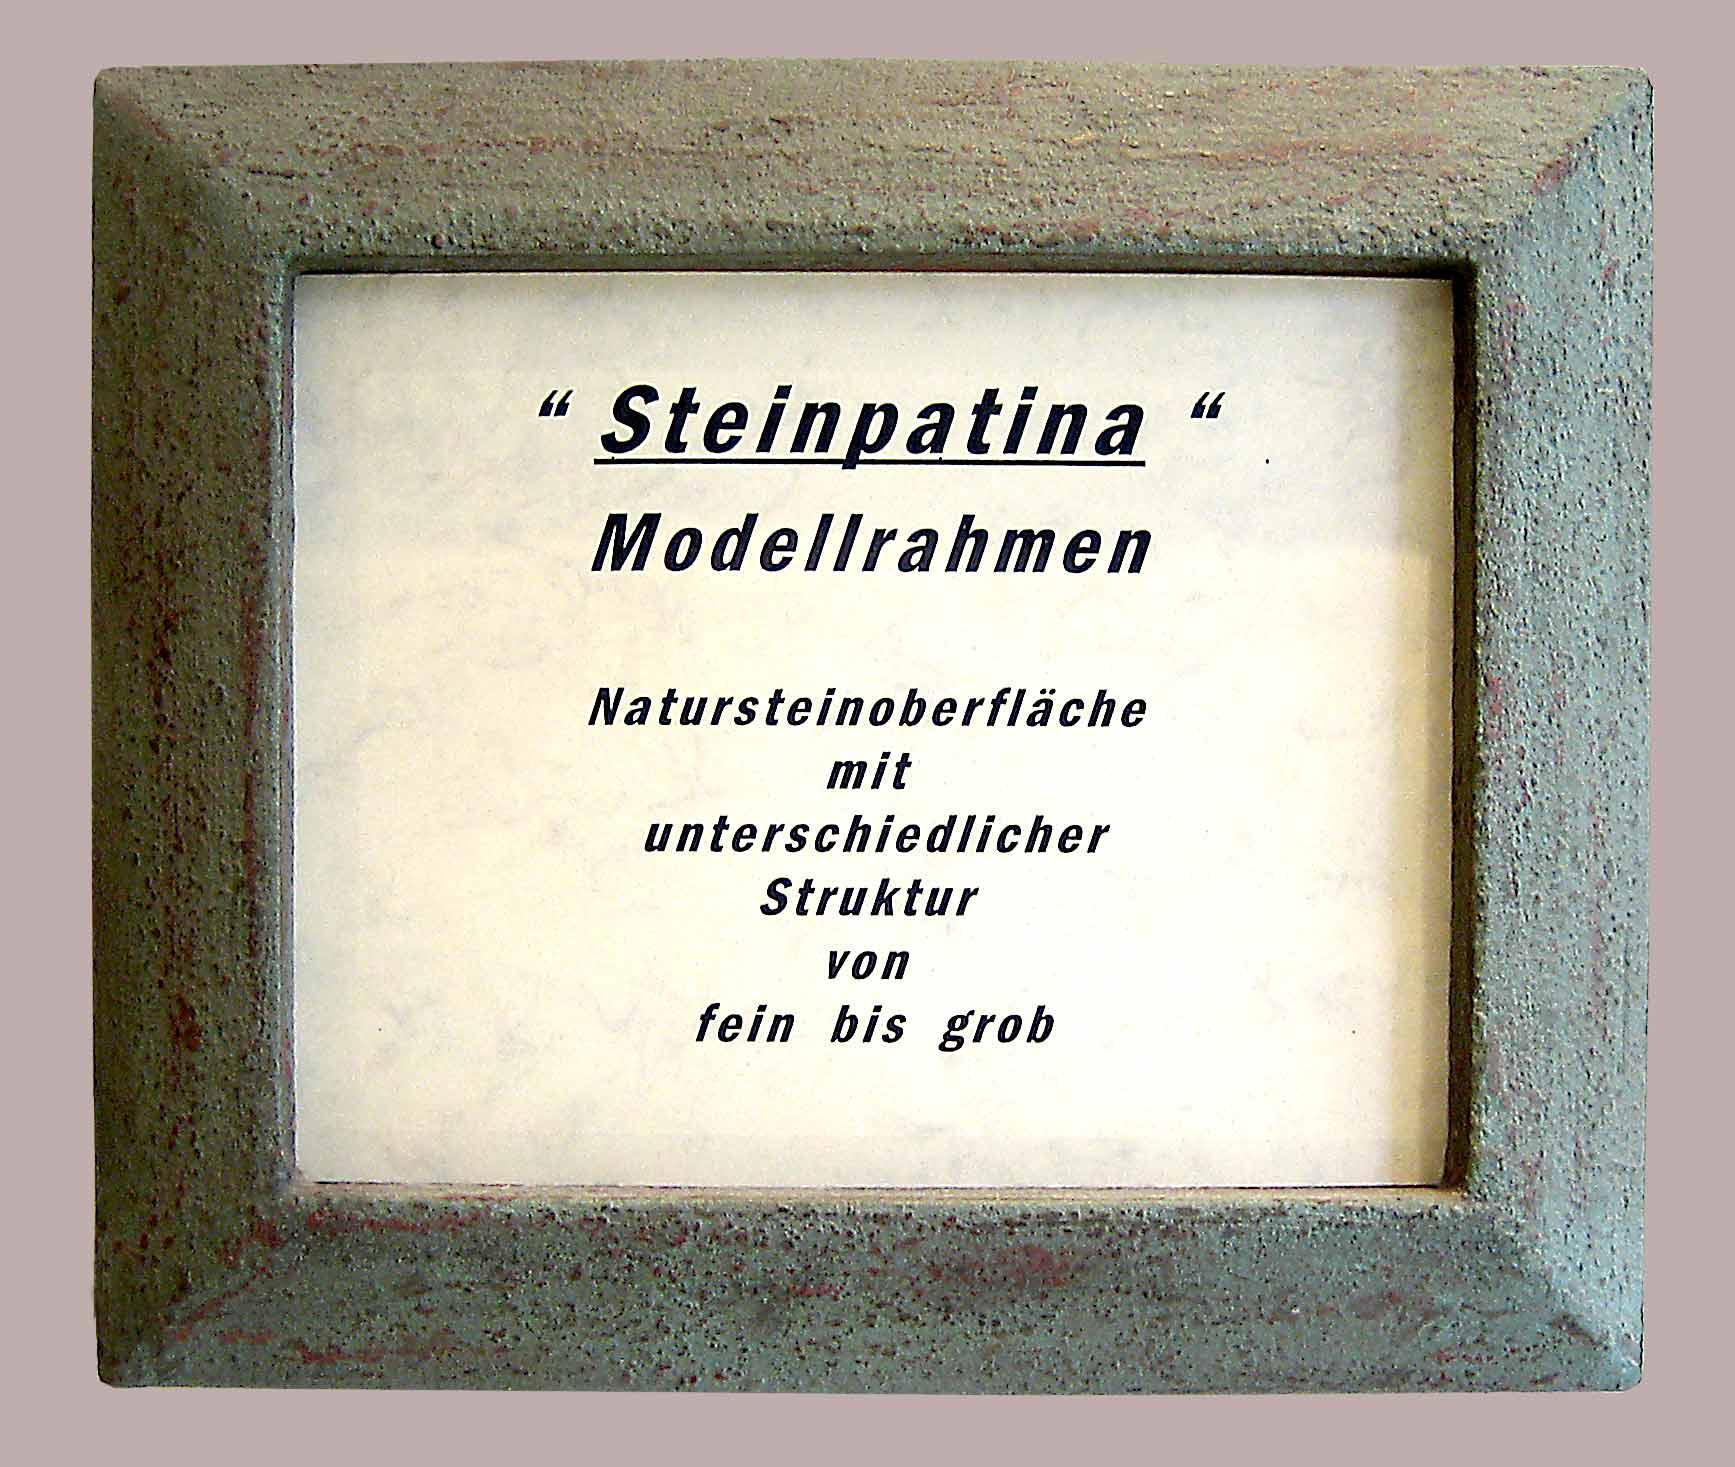 Steinpatina